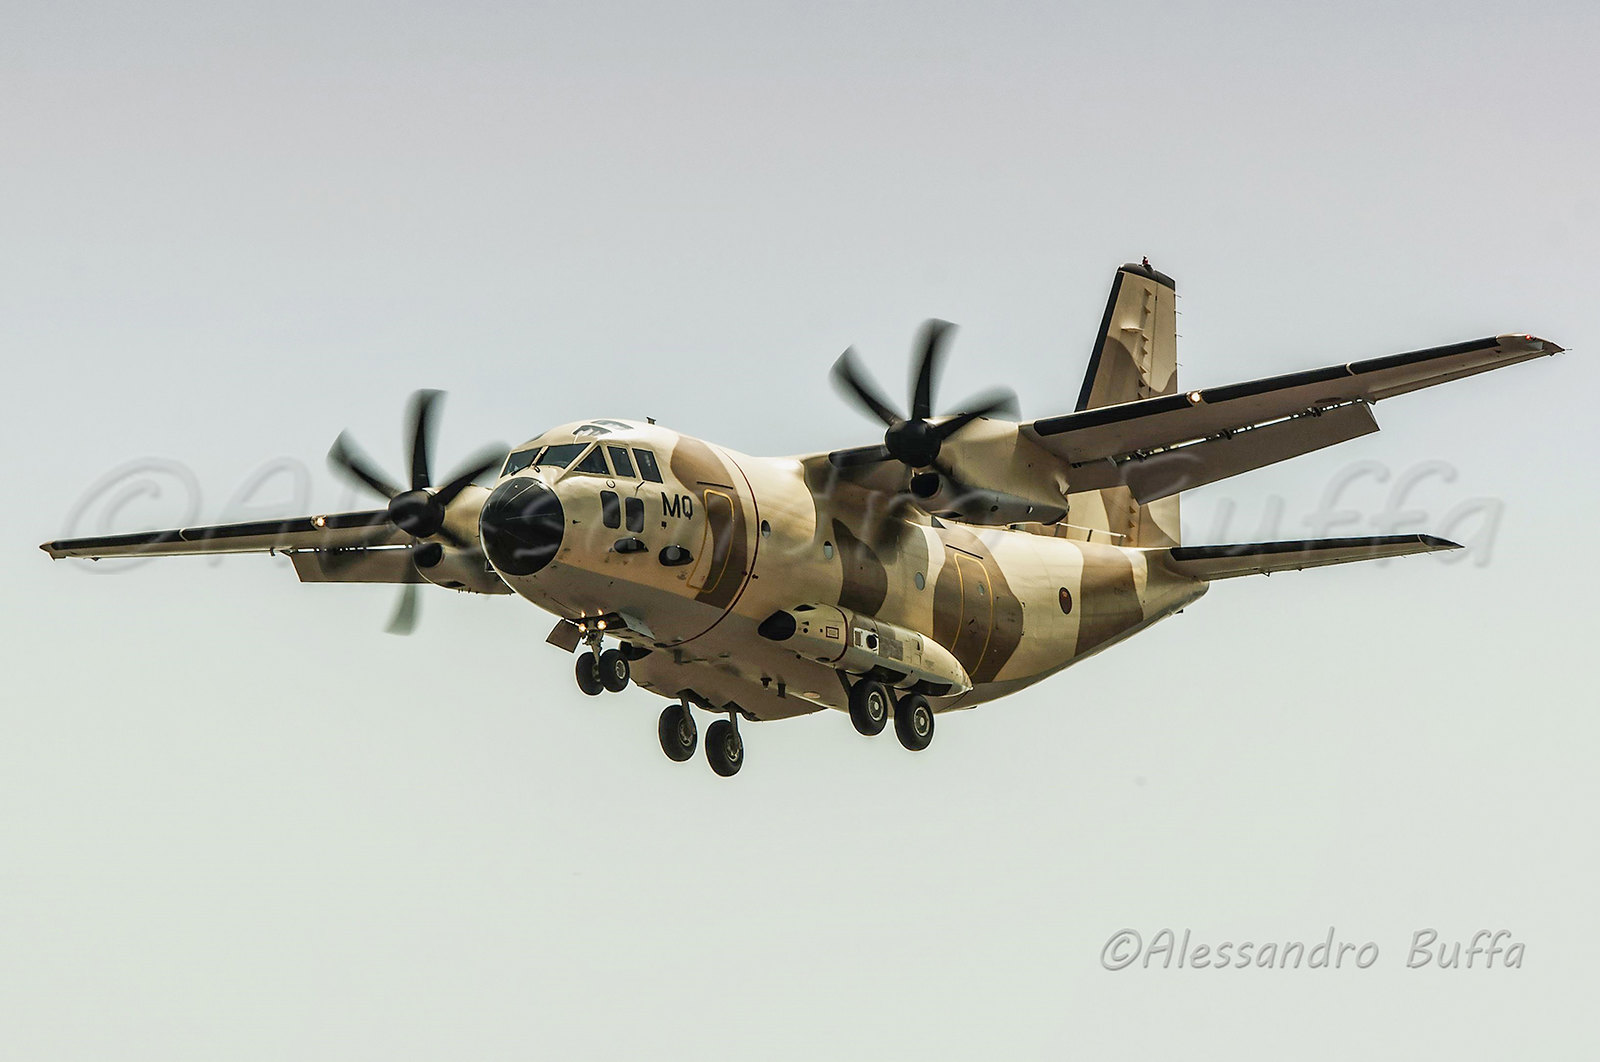 FRA: Photos d'avions de transport - Page 22 16263035804_9ebf302213_h